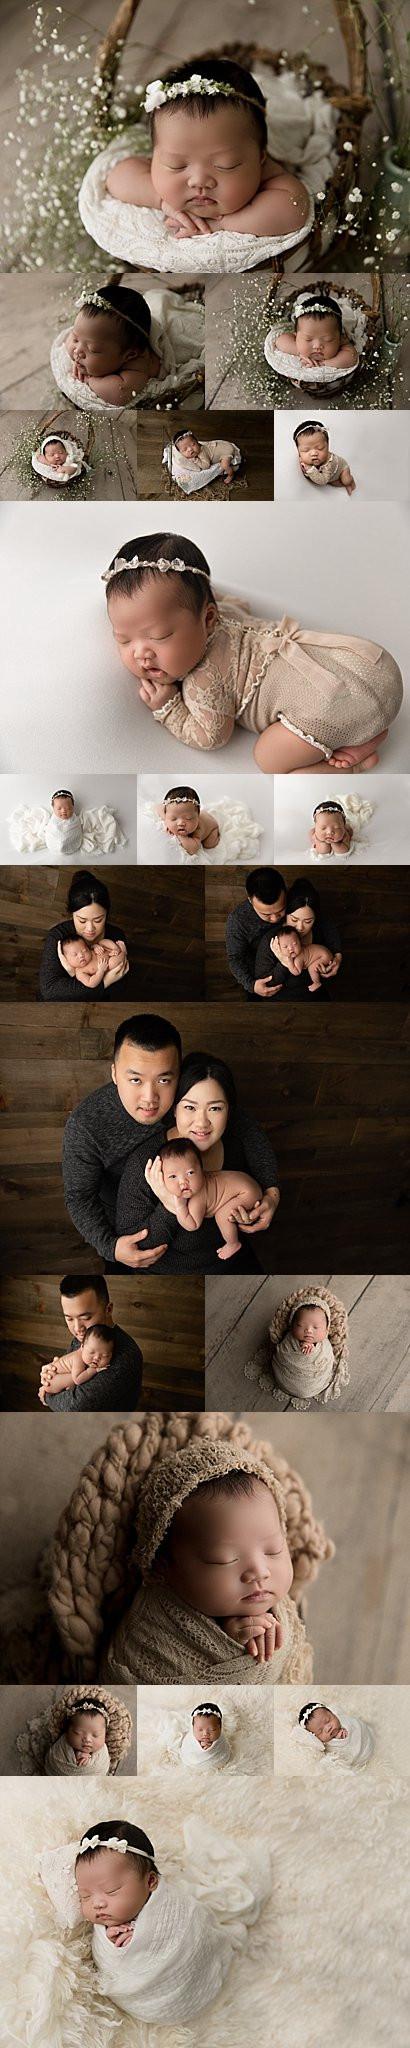 New York newborn photographer